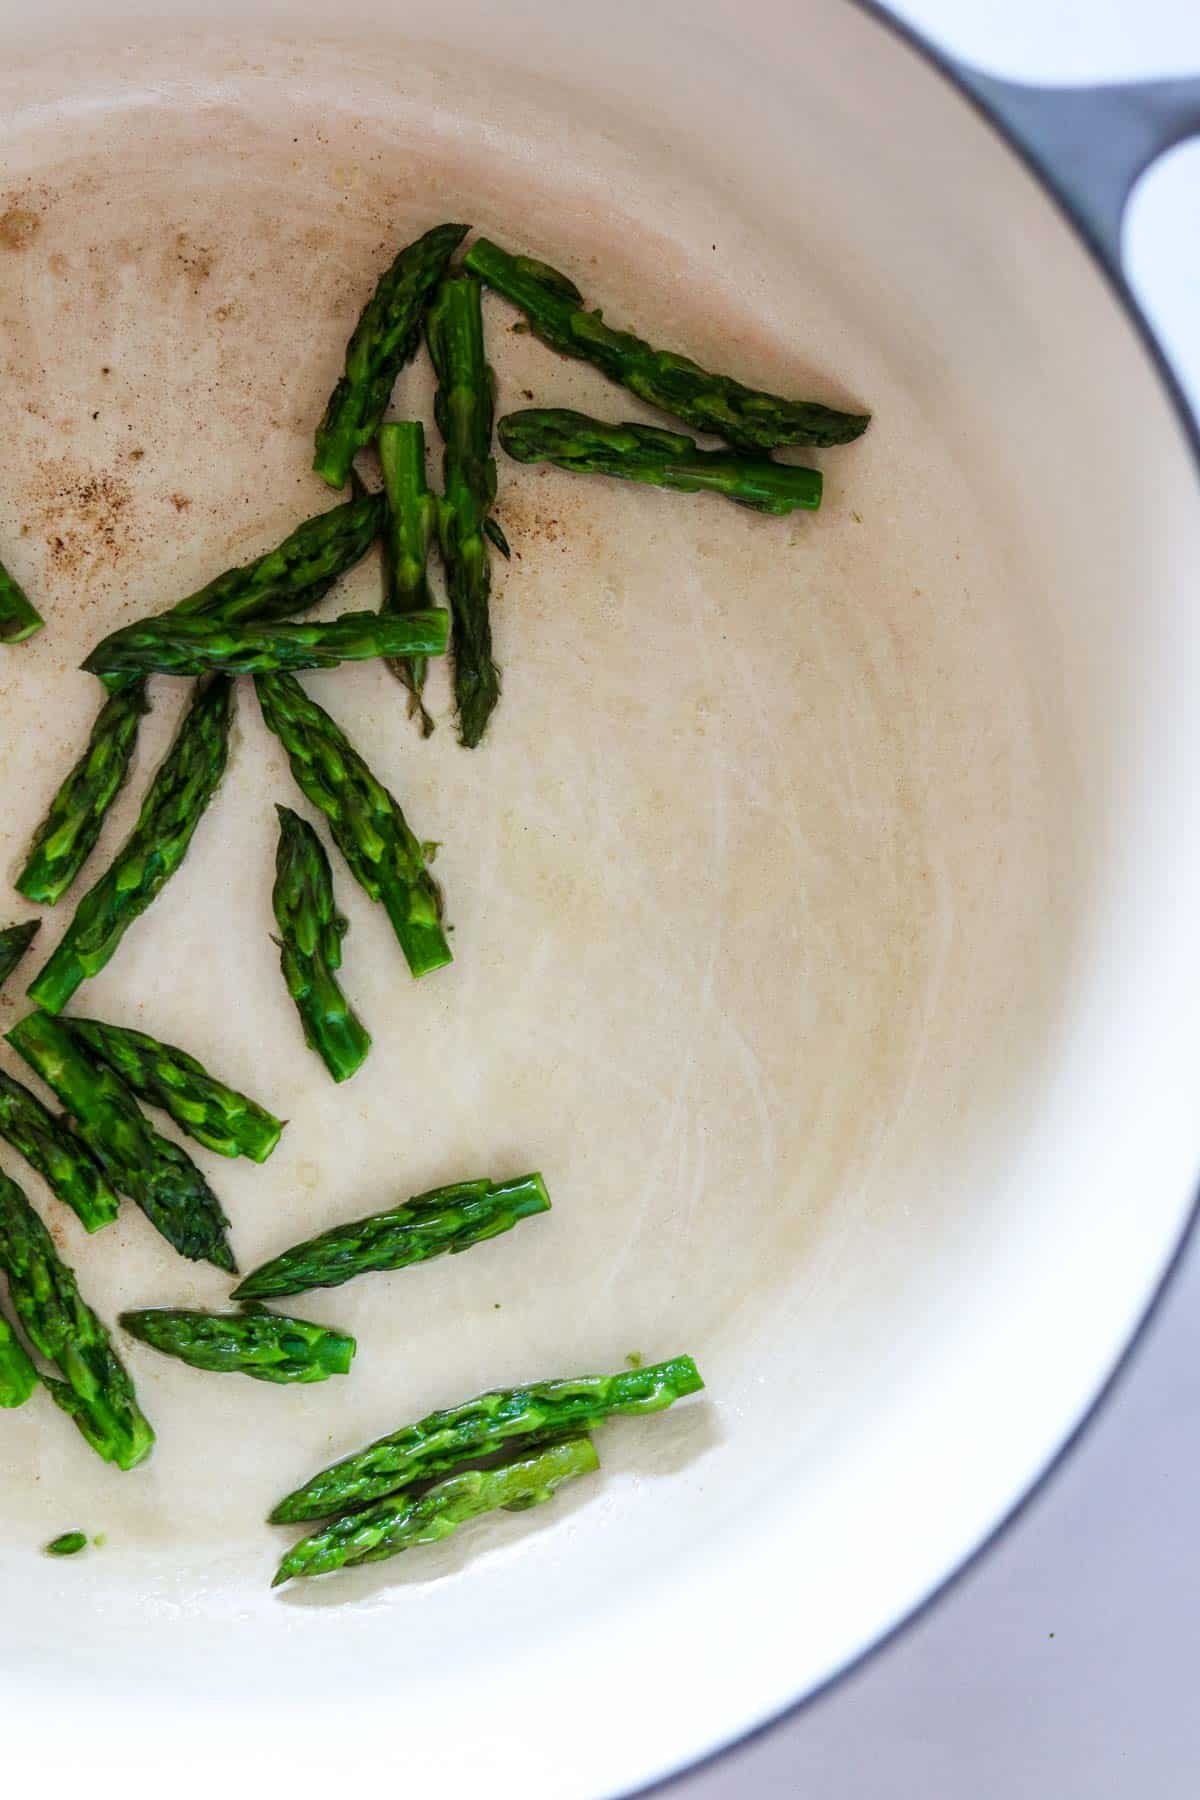 Asparagus tips in a pot.